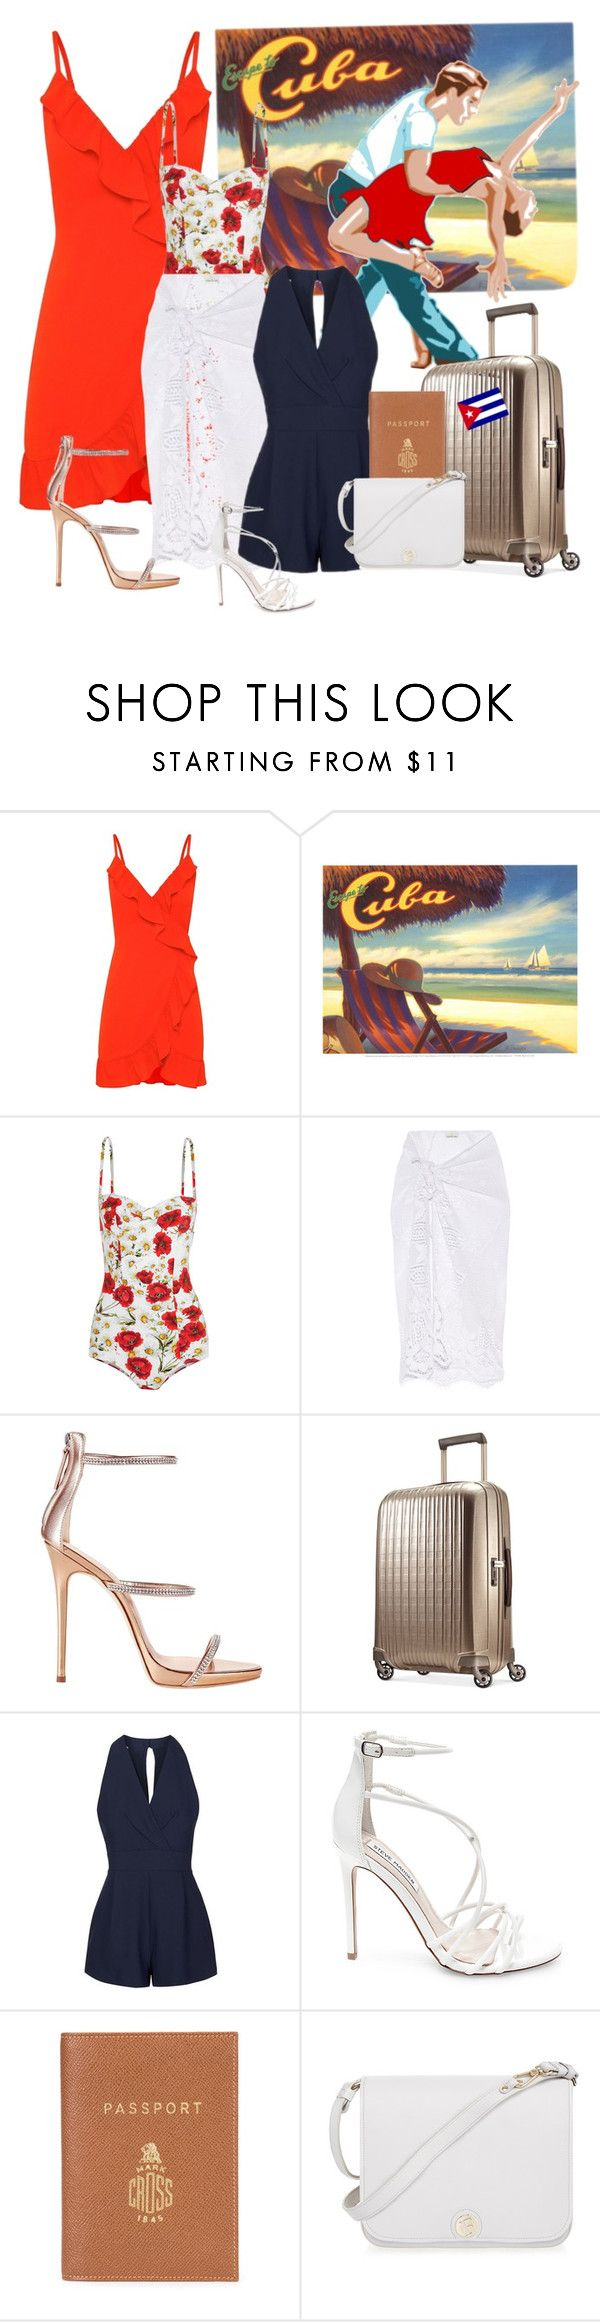 """Pack and go to Cuba !"" by joyfulmum ❤ liked on Polyvore featuring Salsa, Dolce&Gabbana, Miguelina, Giuseppe Zanotti, Hartmann, Topshop, Steve Madden, Mark Cross and Furla"